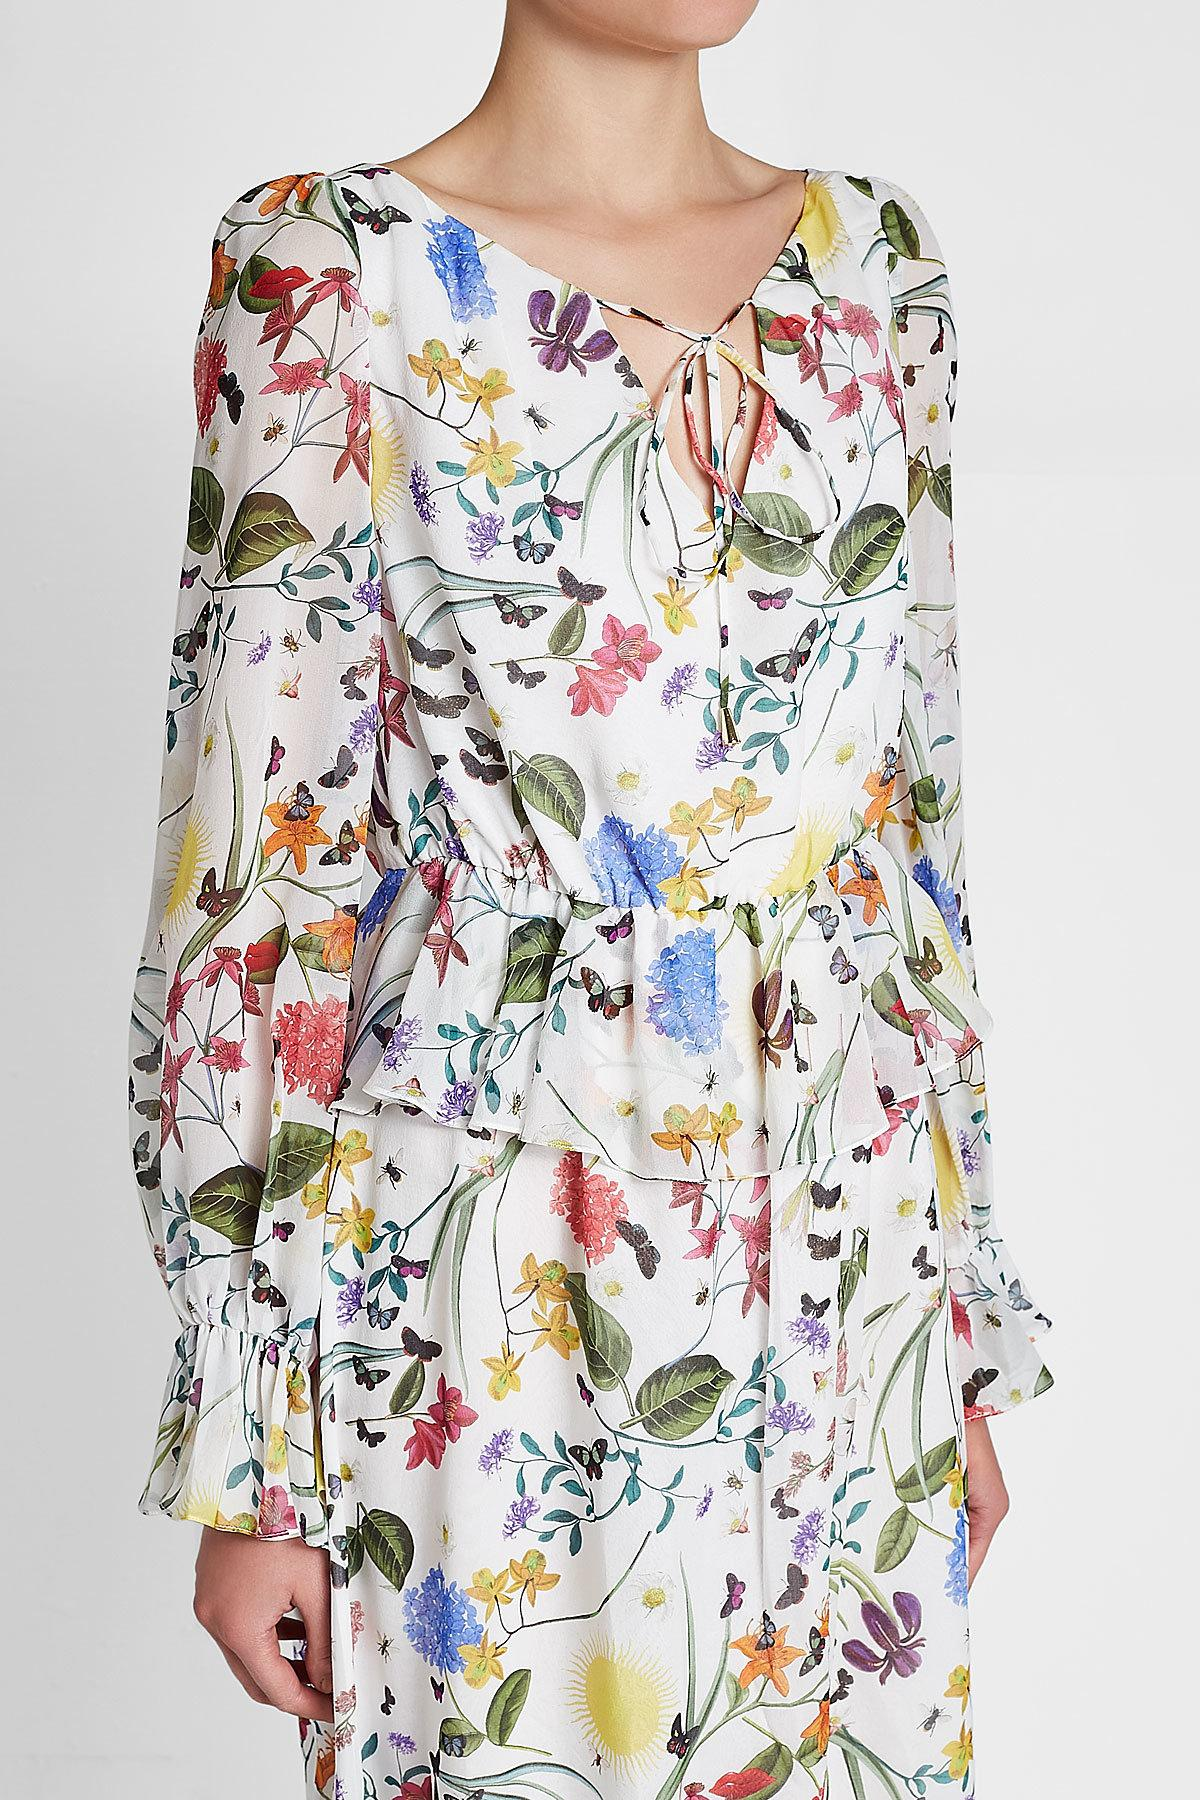 6cce57a90b9d1 Borgo De Nor - Multicolor Lily Printed Silk Dress - Lyst. View fullscreen